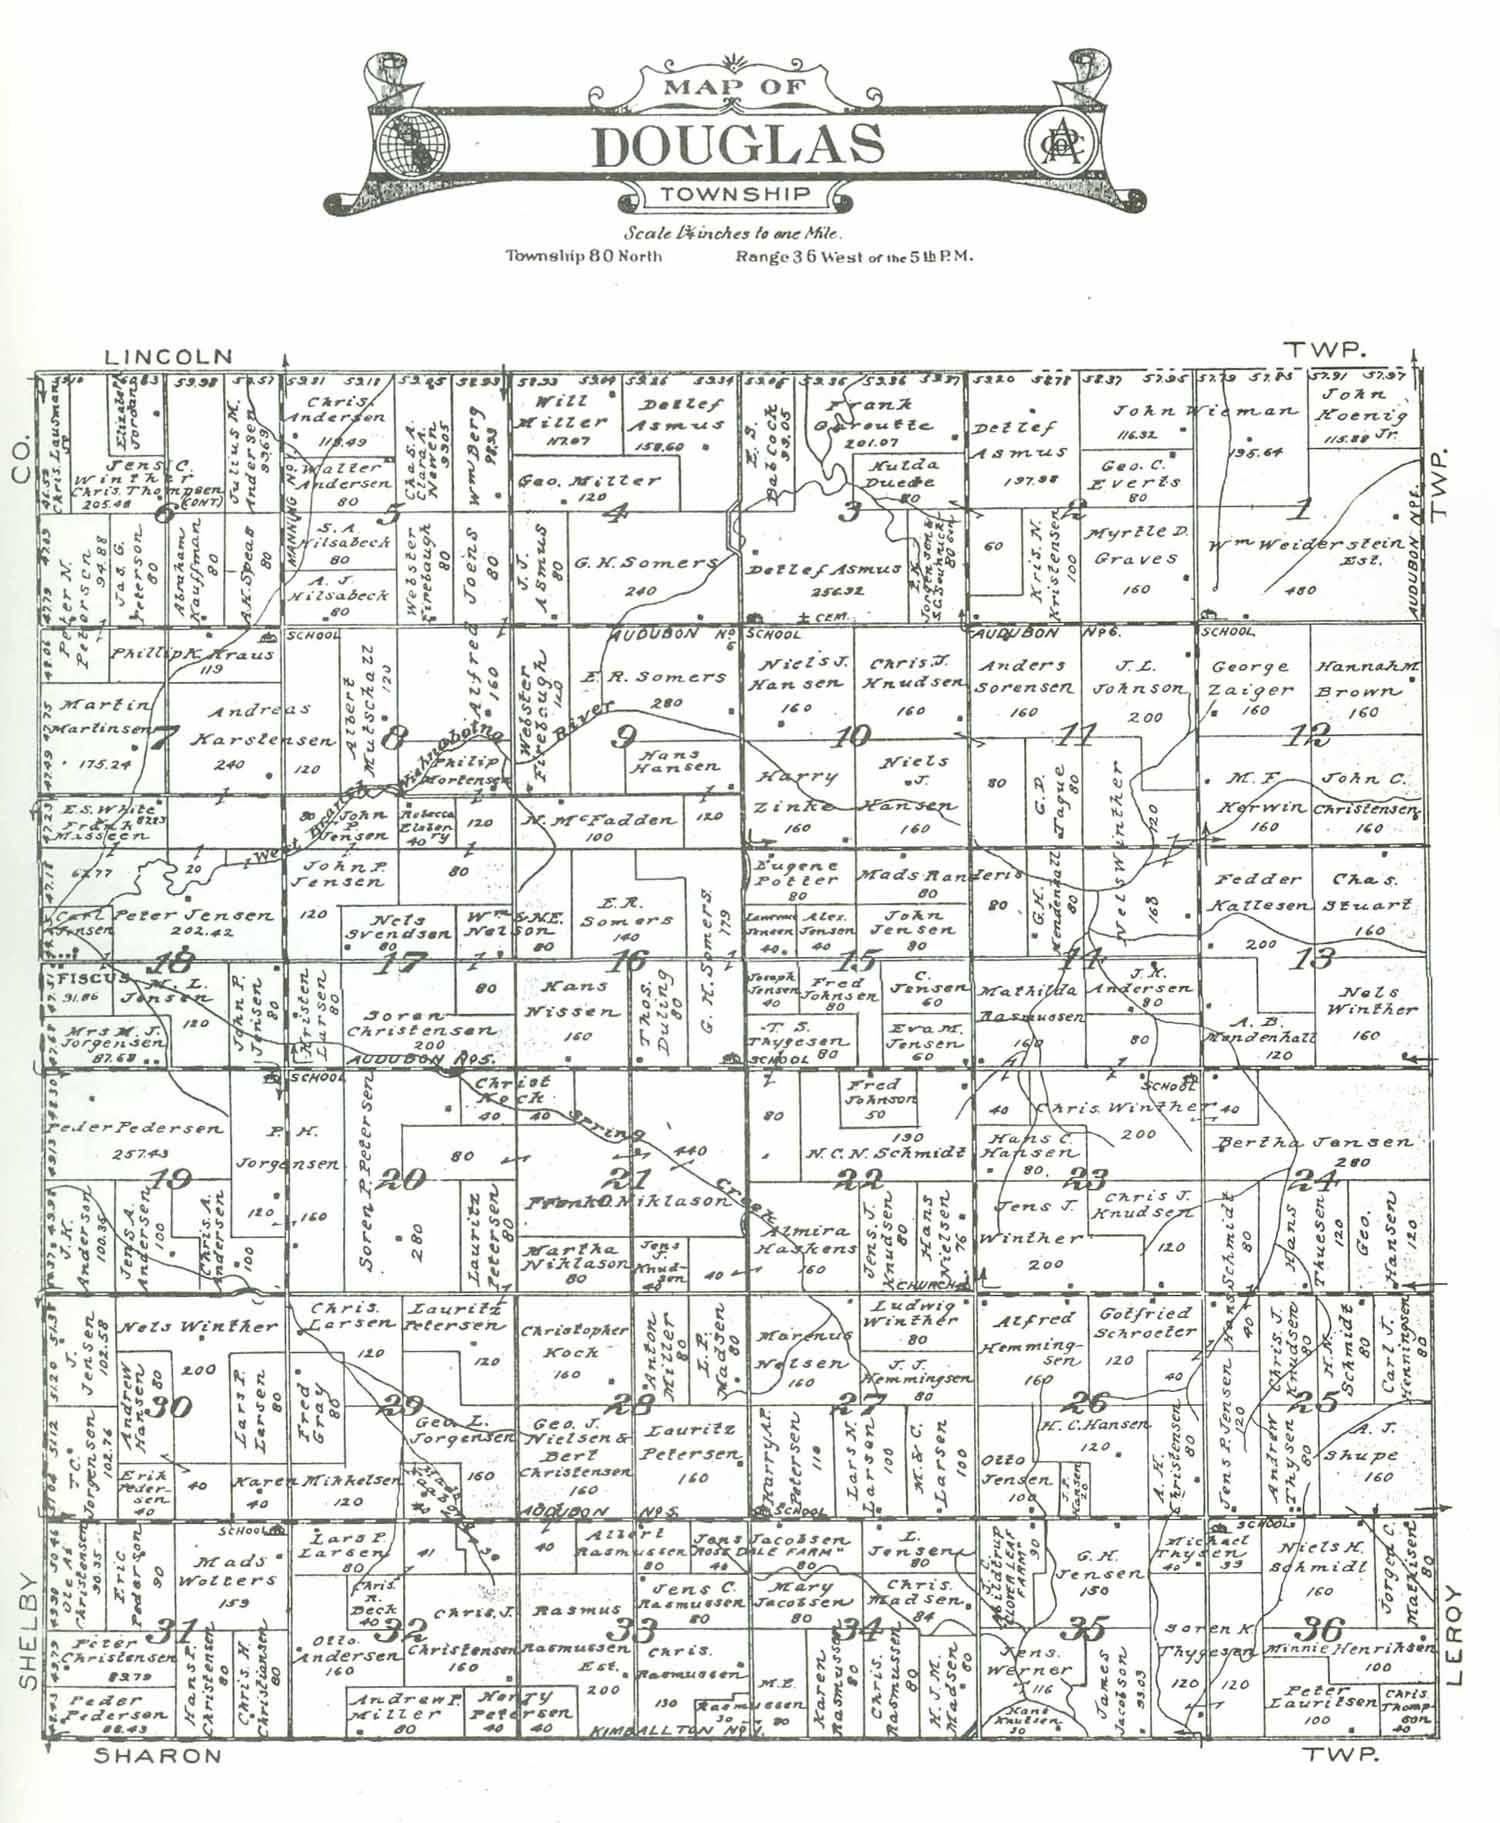 Audubon Iowa Map.Audubon County Iagenweb Iowa Maps 1921 Anderson Atlas Douglas